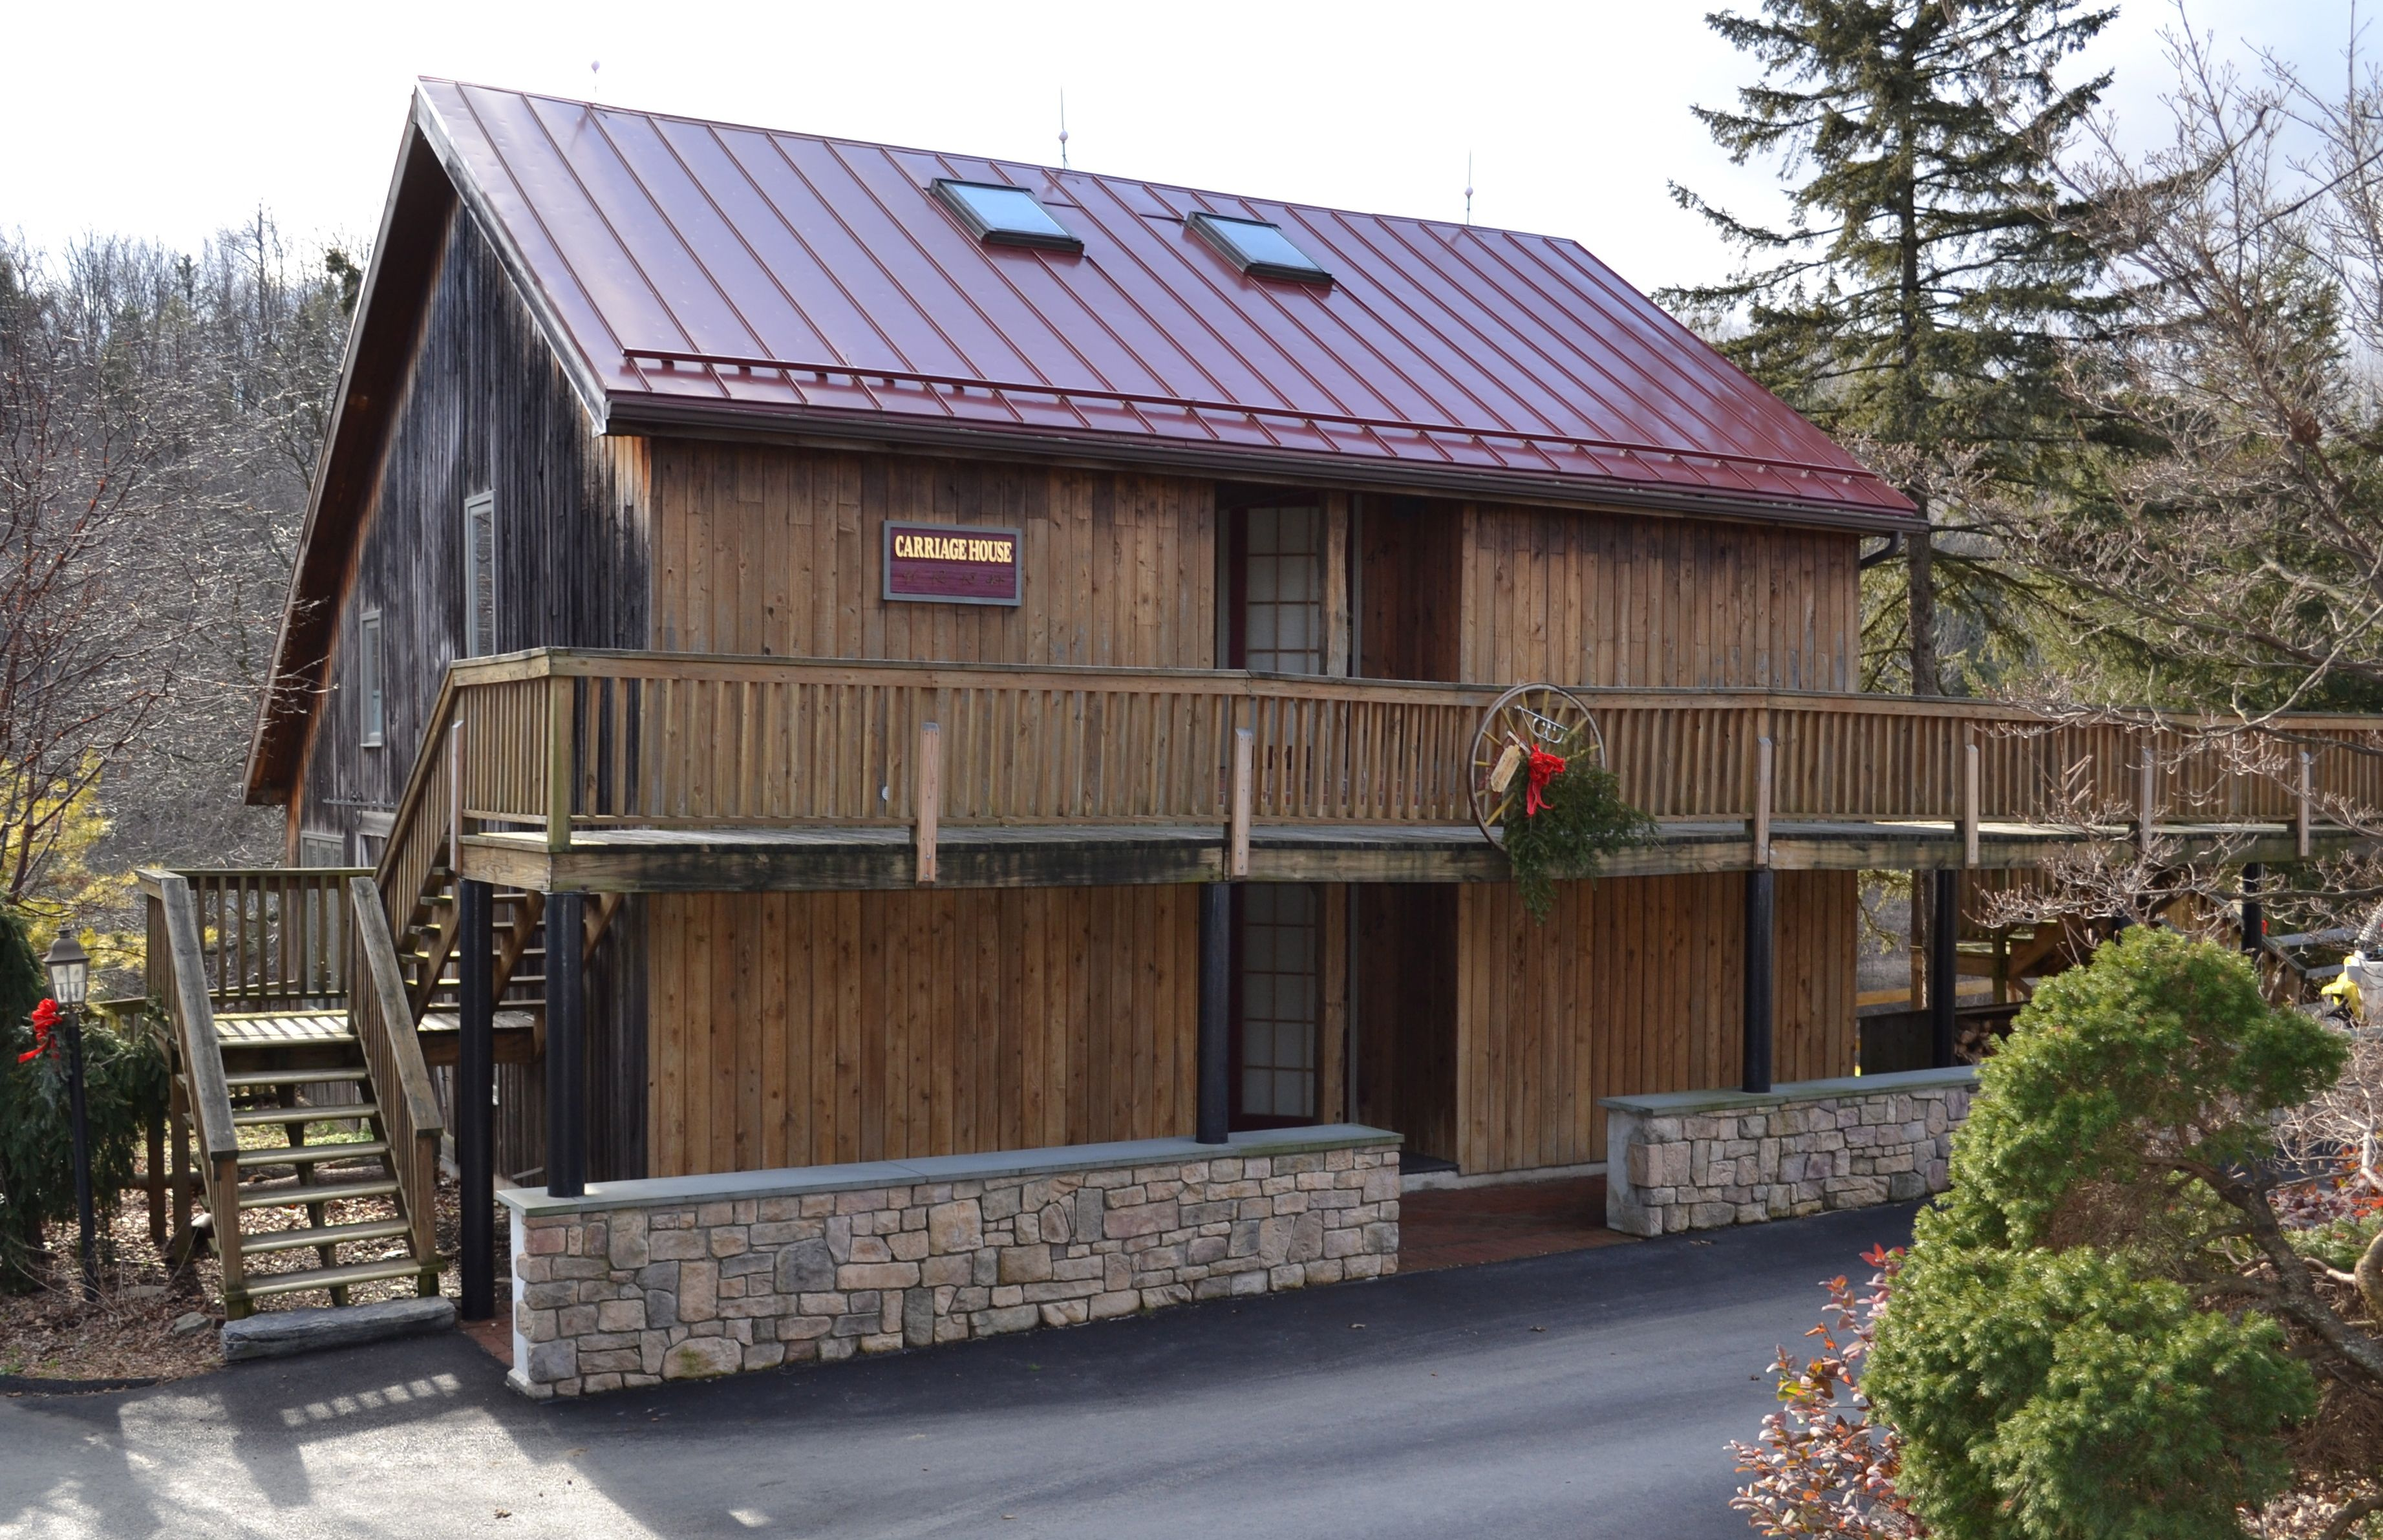 Take me here now.....Glasburn Inn, Lehigh Valley PA